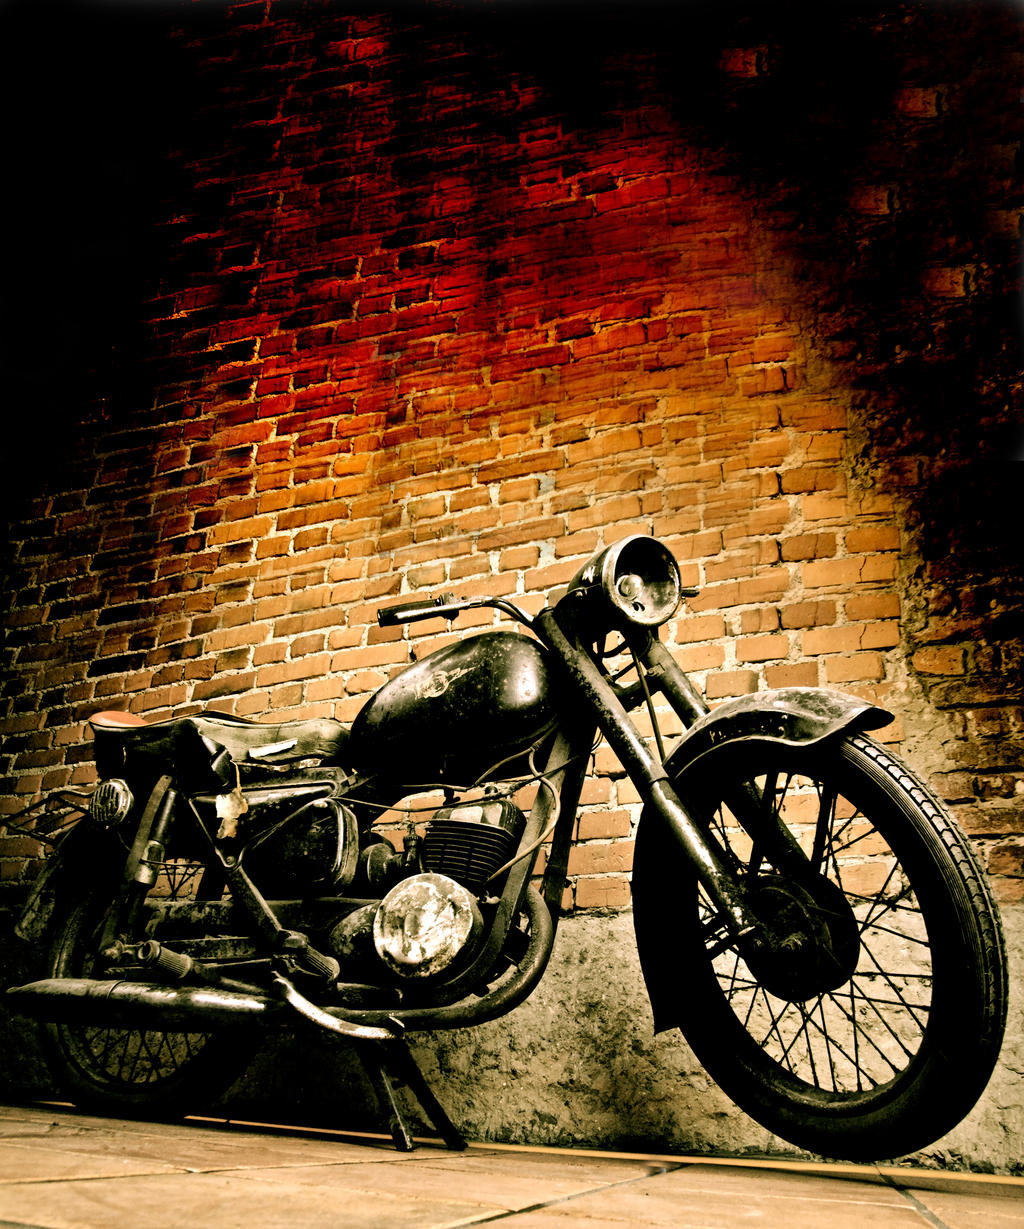 Old motorcycle vertical